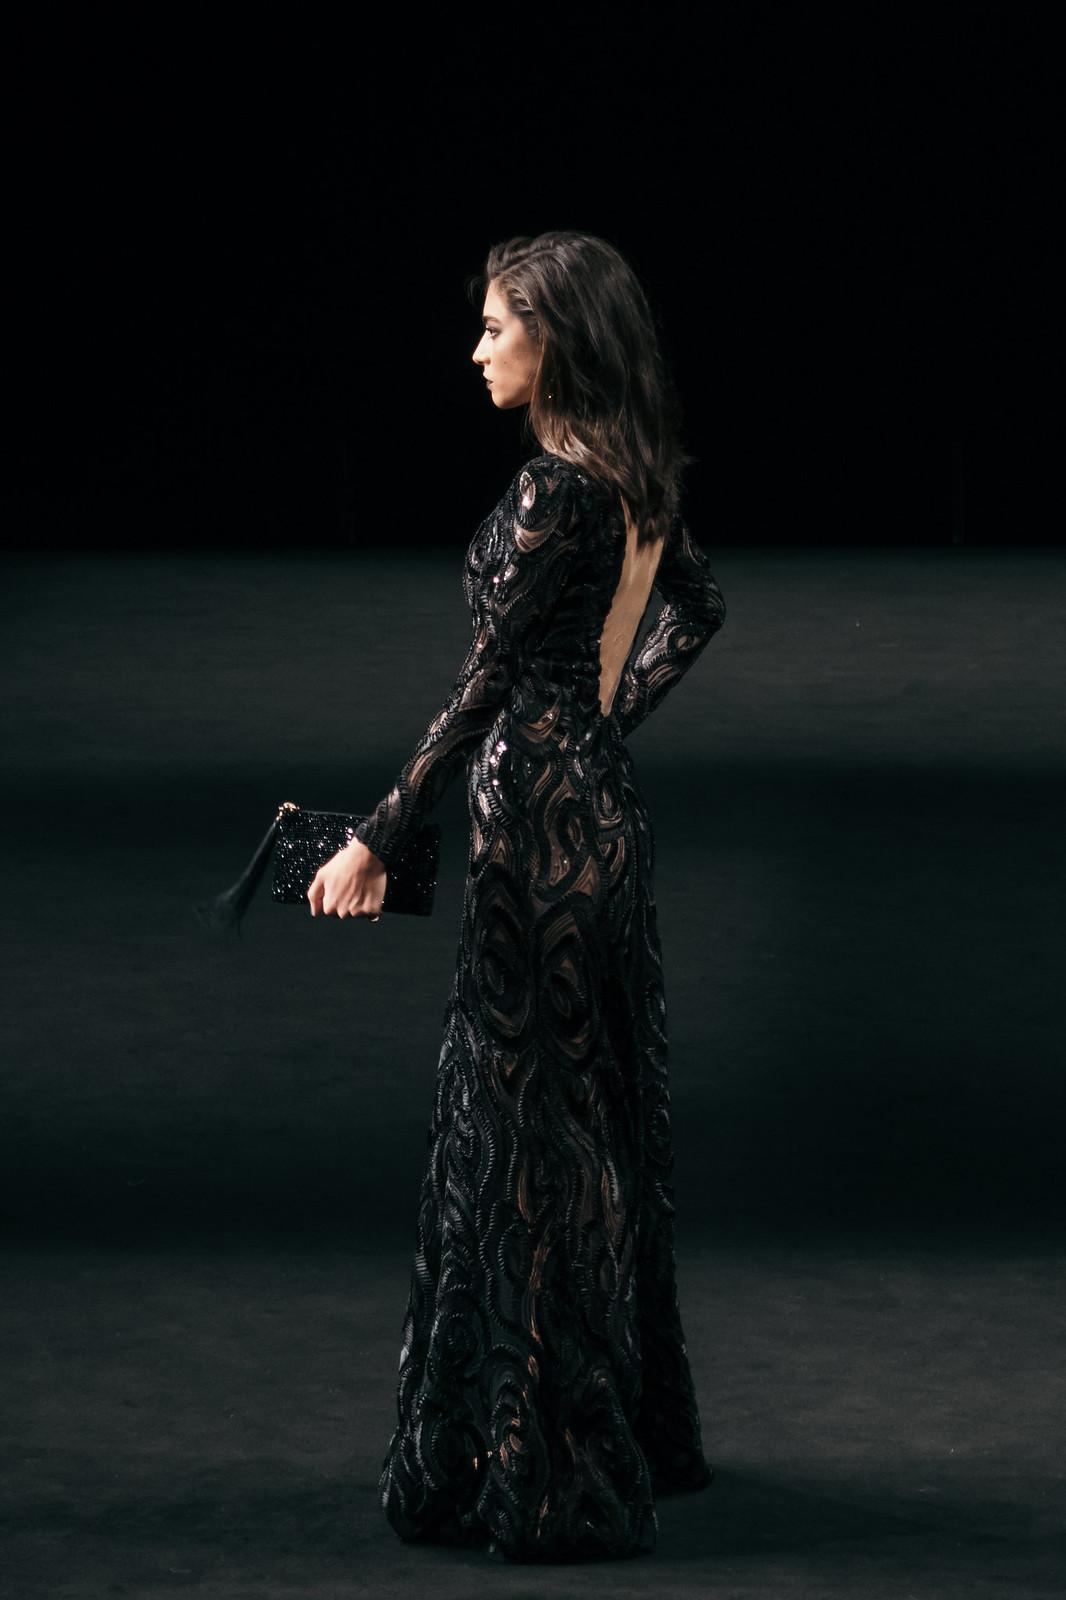 Jessie Chanes - Seams for a desire - 080 Bacelona Fashion #080bcnfasion -57